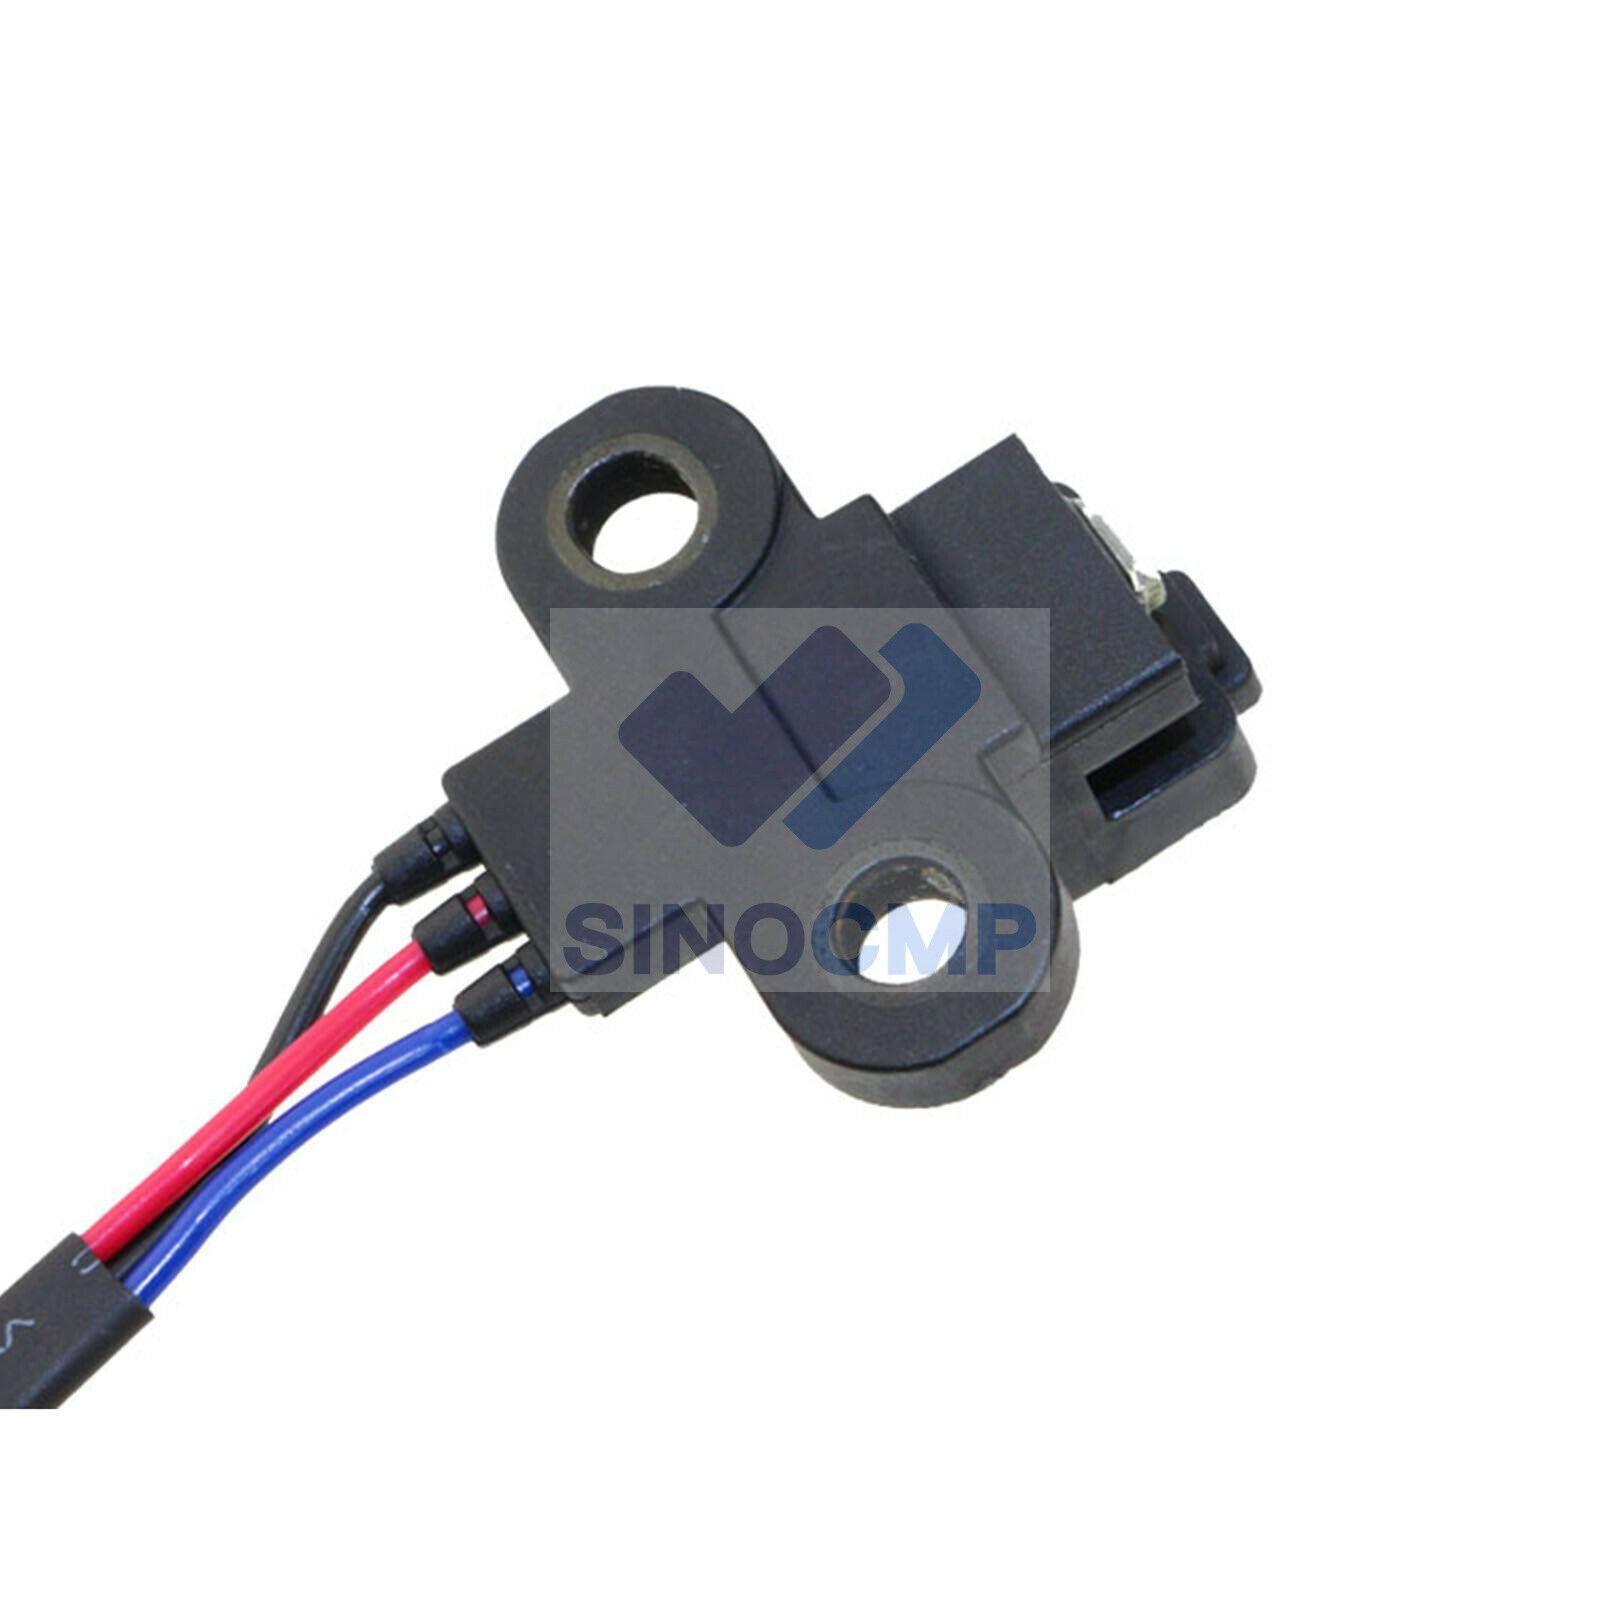 MD342826 J5T25871 Crankshaft Position Sensor For Mitsubishi Montero Challenger